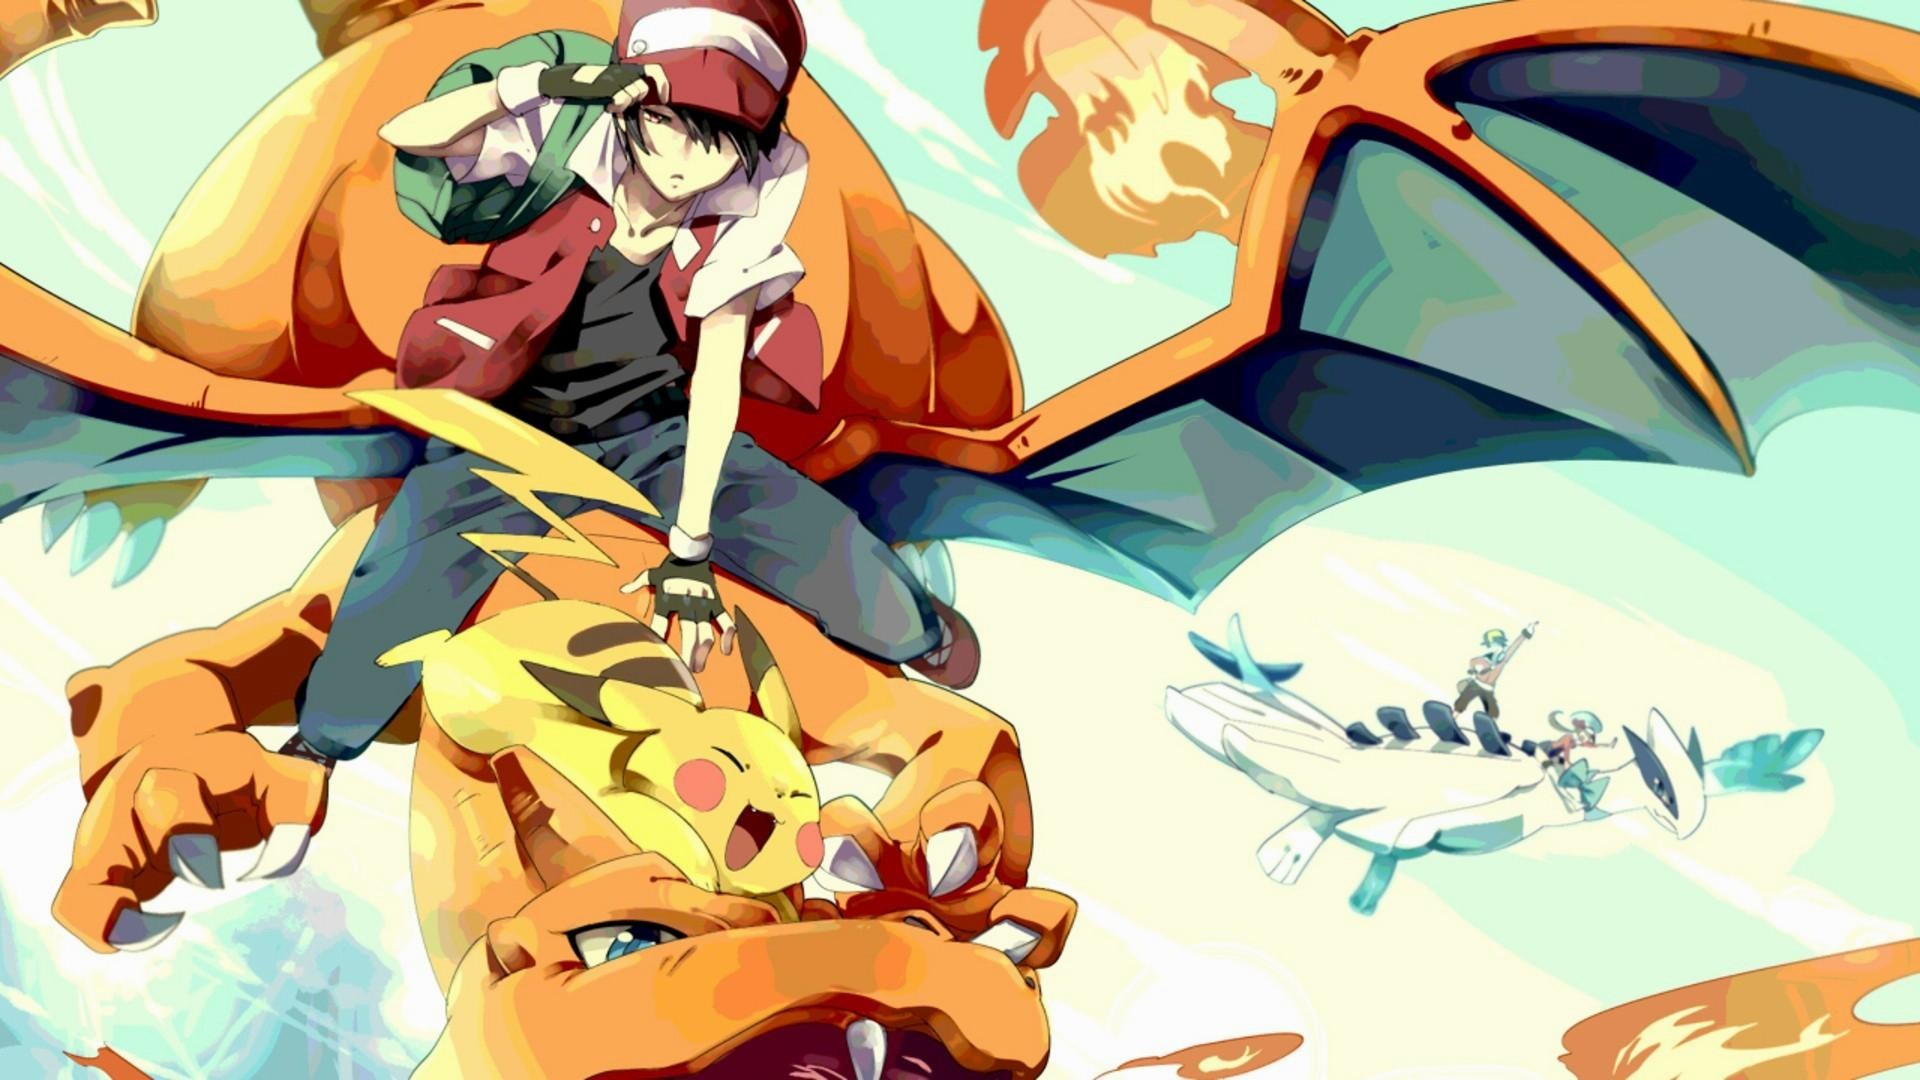 HD-Pokemon-Charizard-Images-1